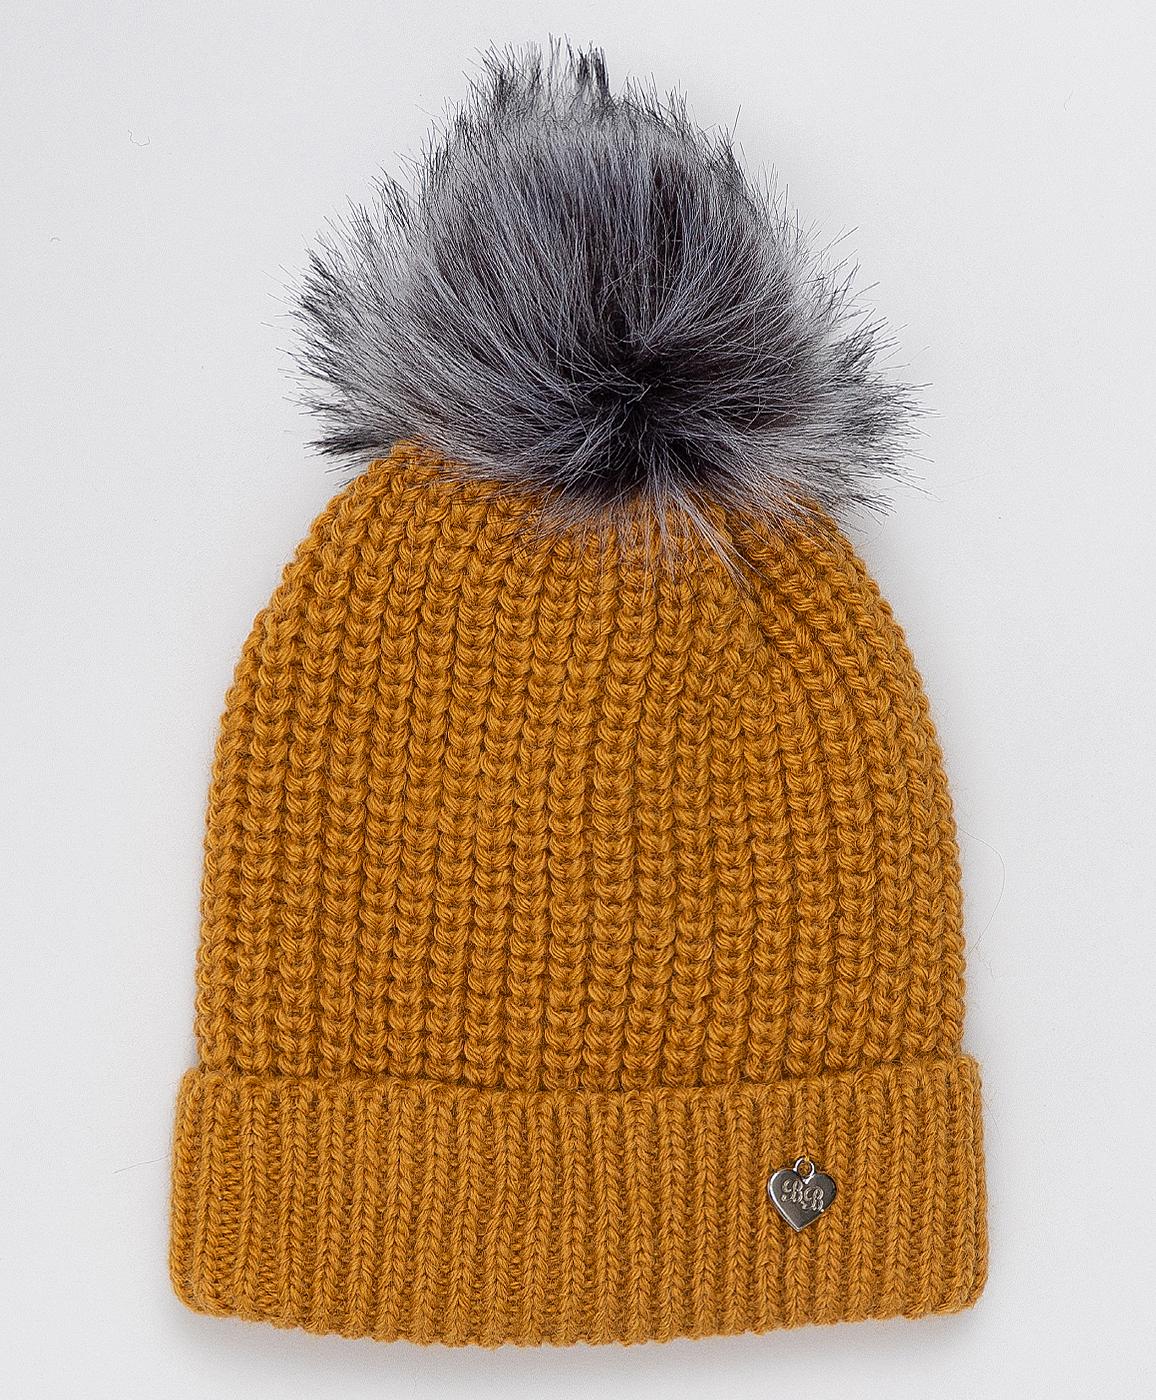 Купить 220BBGJX73032700, Желтая шапка с помпоном Button Blue, желтый, 54, Вязаный трикотаж, Женский, Зима, ОСЕНЬ/ЗИМА 2020-2021 (shop: GulliverMarket Gulliver Market)